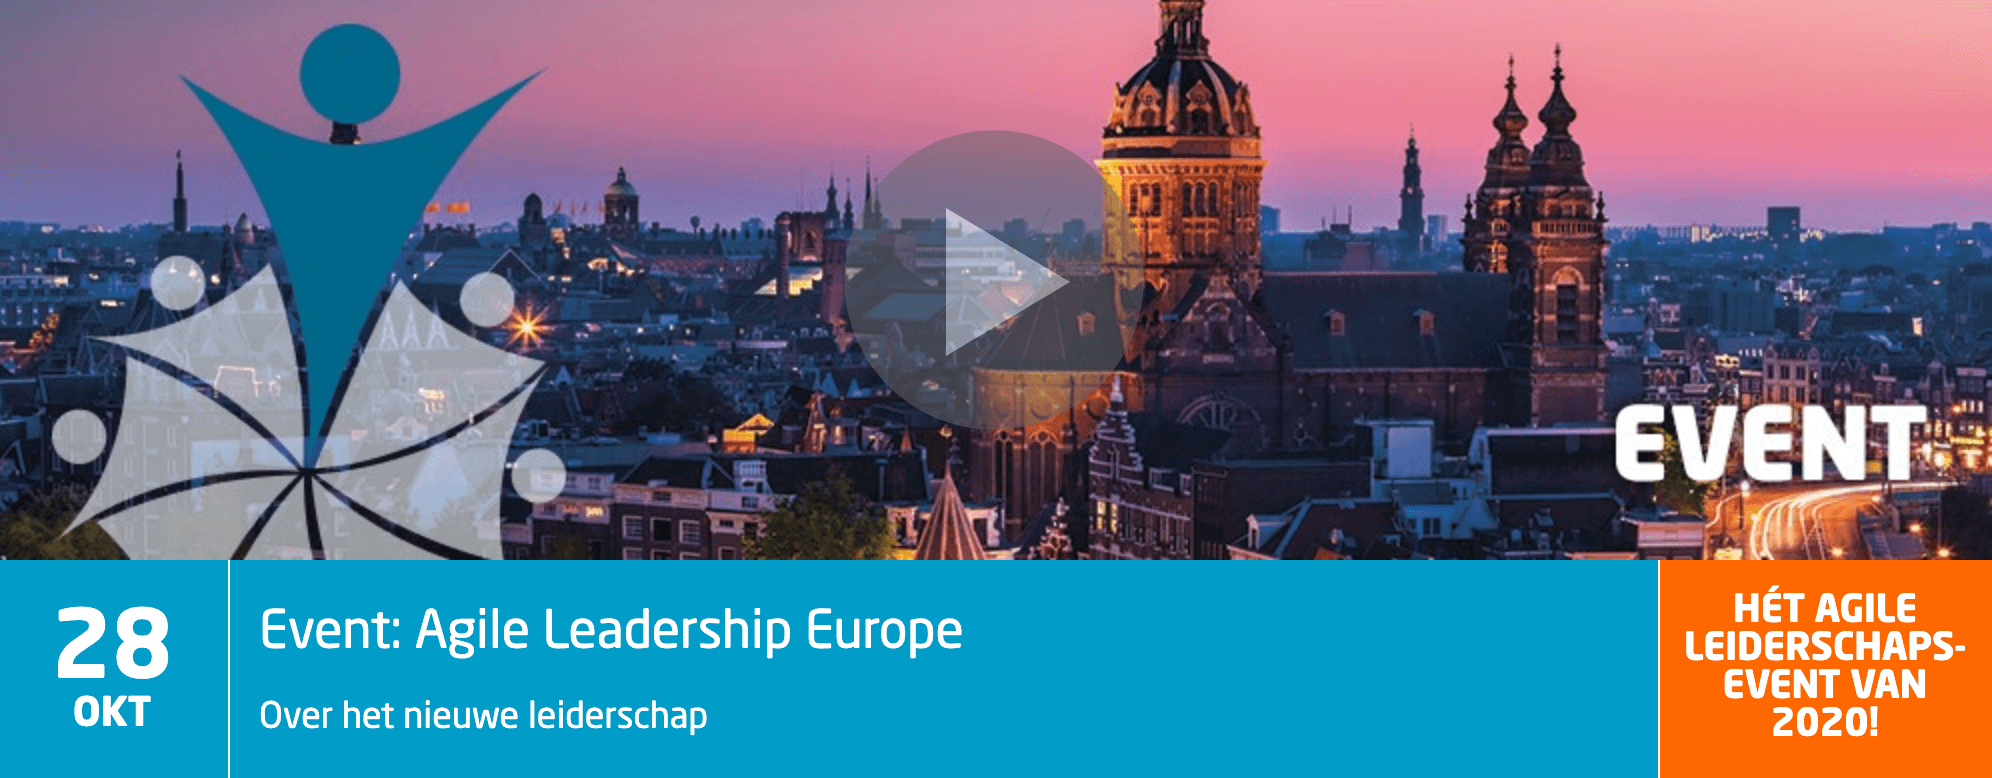 Event - Agile Leadership Europe